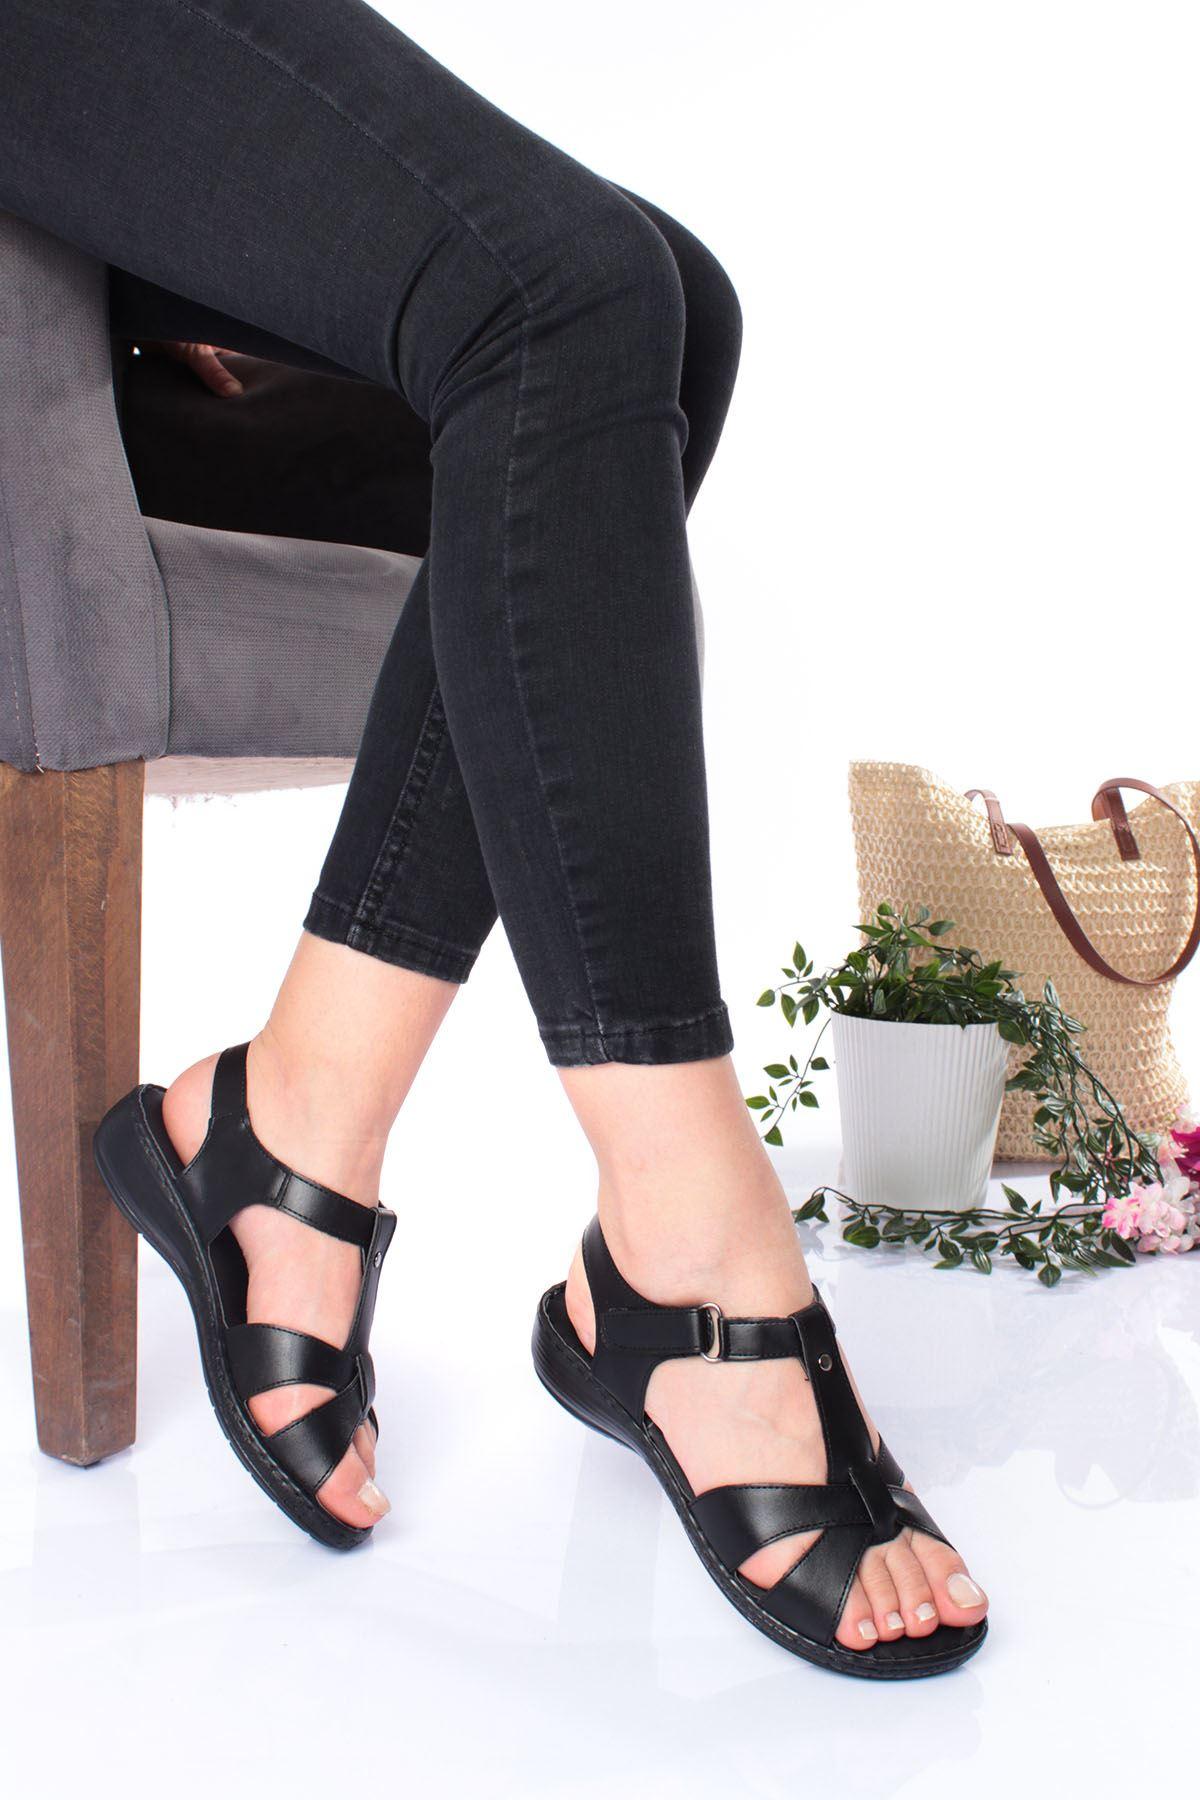 Ortopedik Ped İçi Deri Alçak Taban Siyah Sandalet